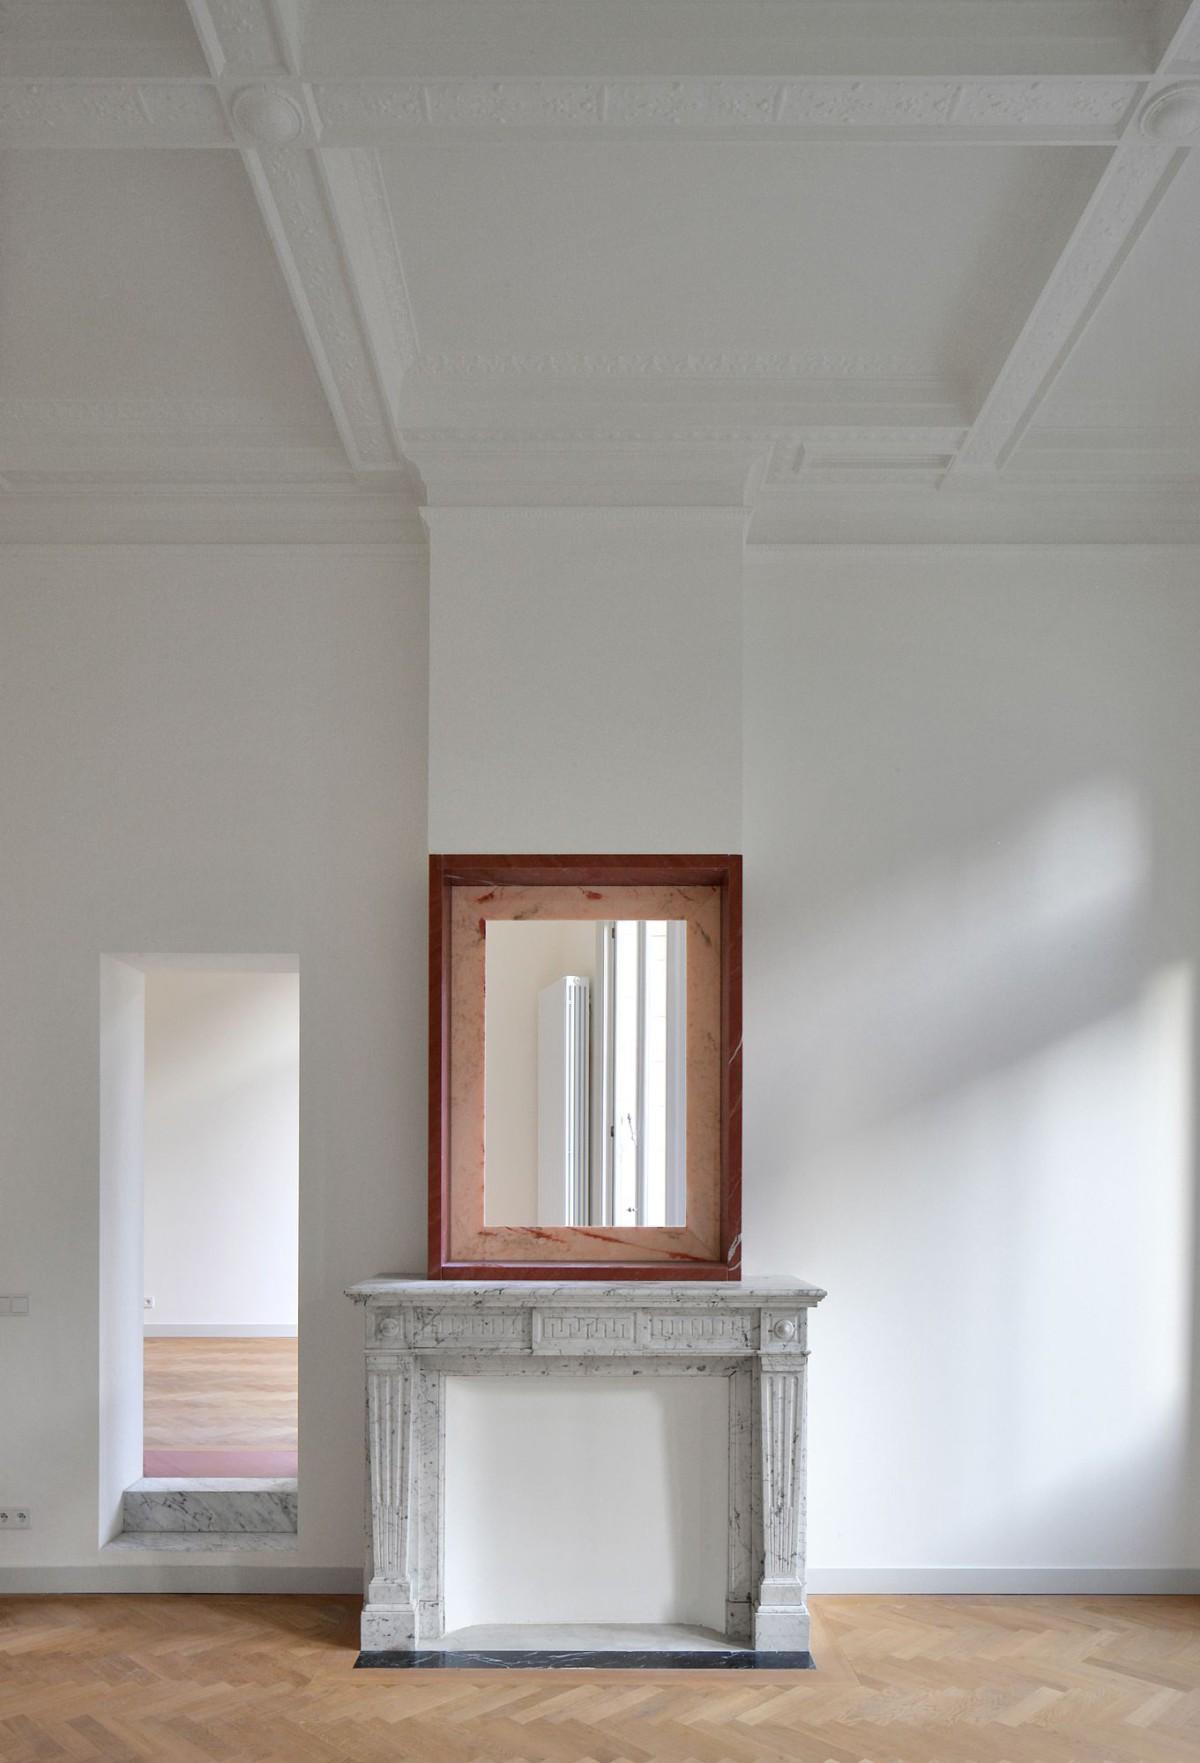 Bovenbouw Architectuur . Refurbishment of 3 historical buildings . Antwerp (18)